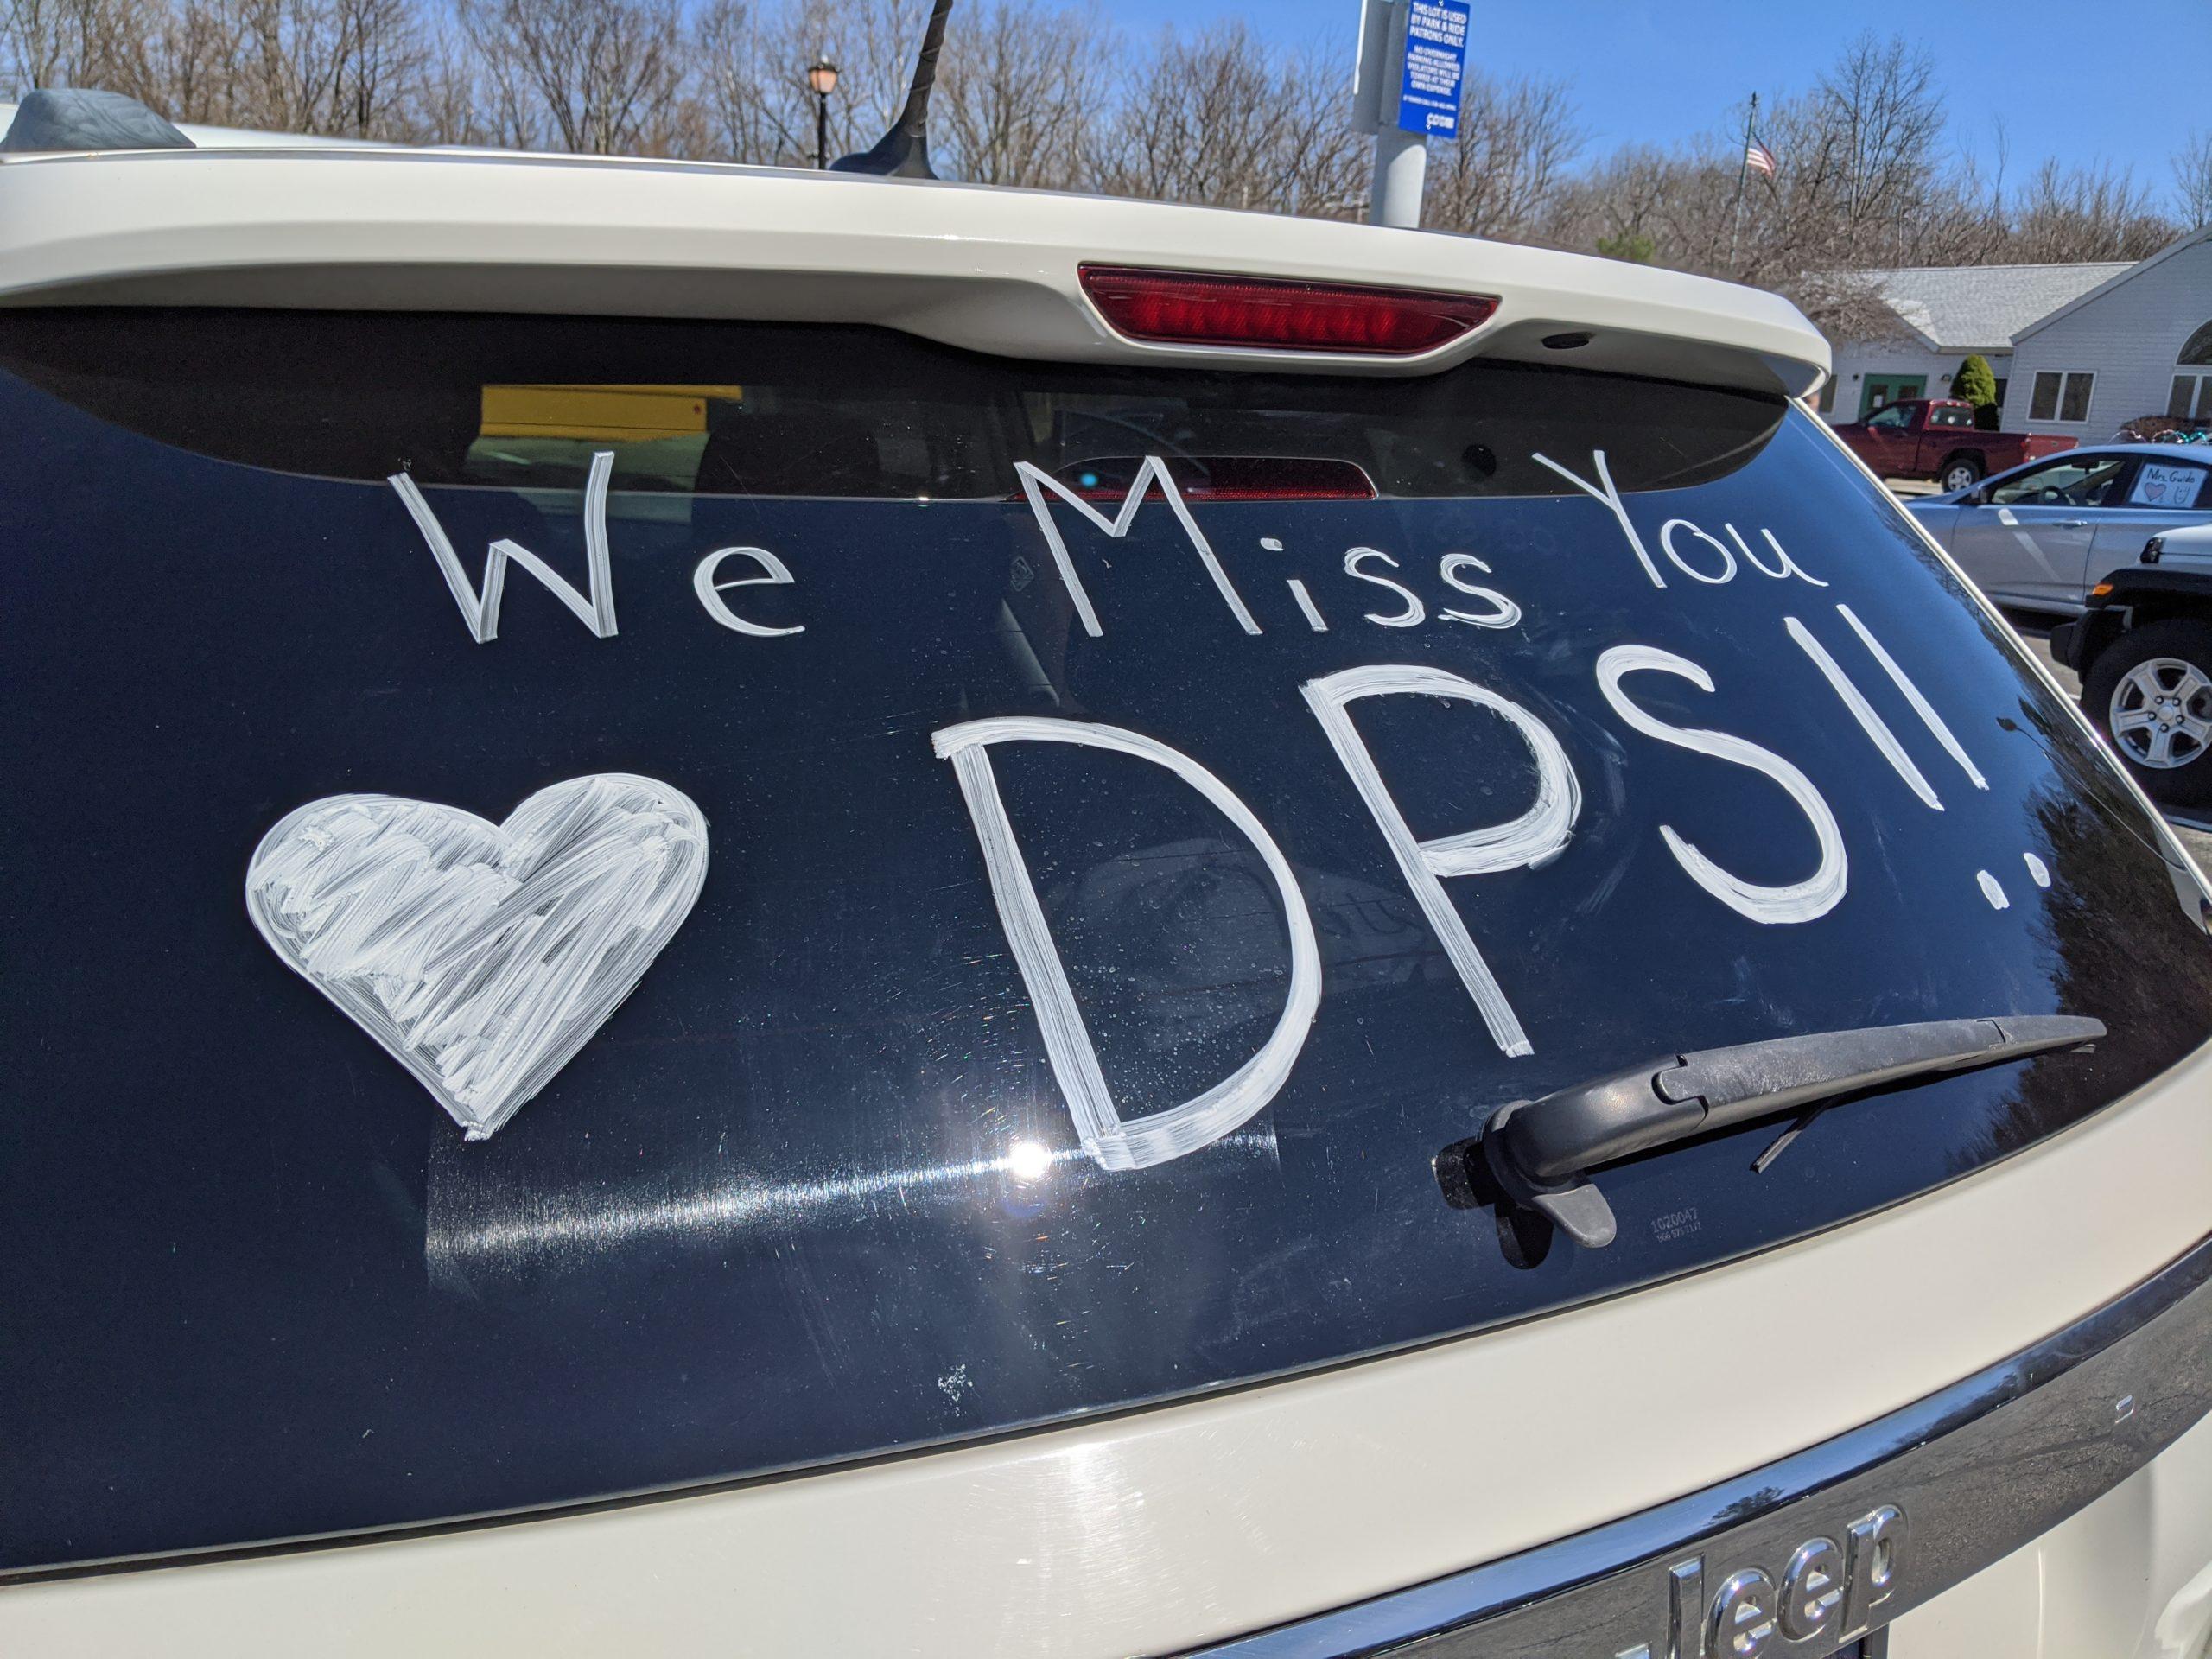 Car in DPS parade